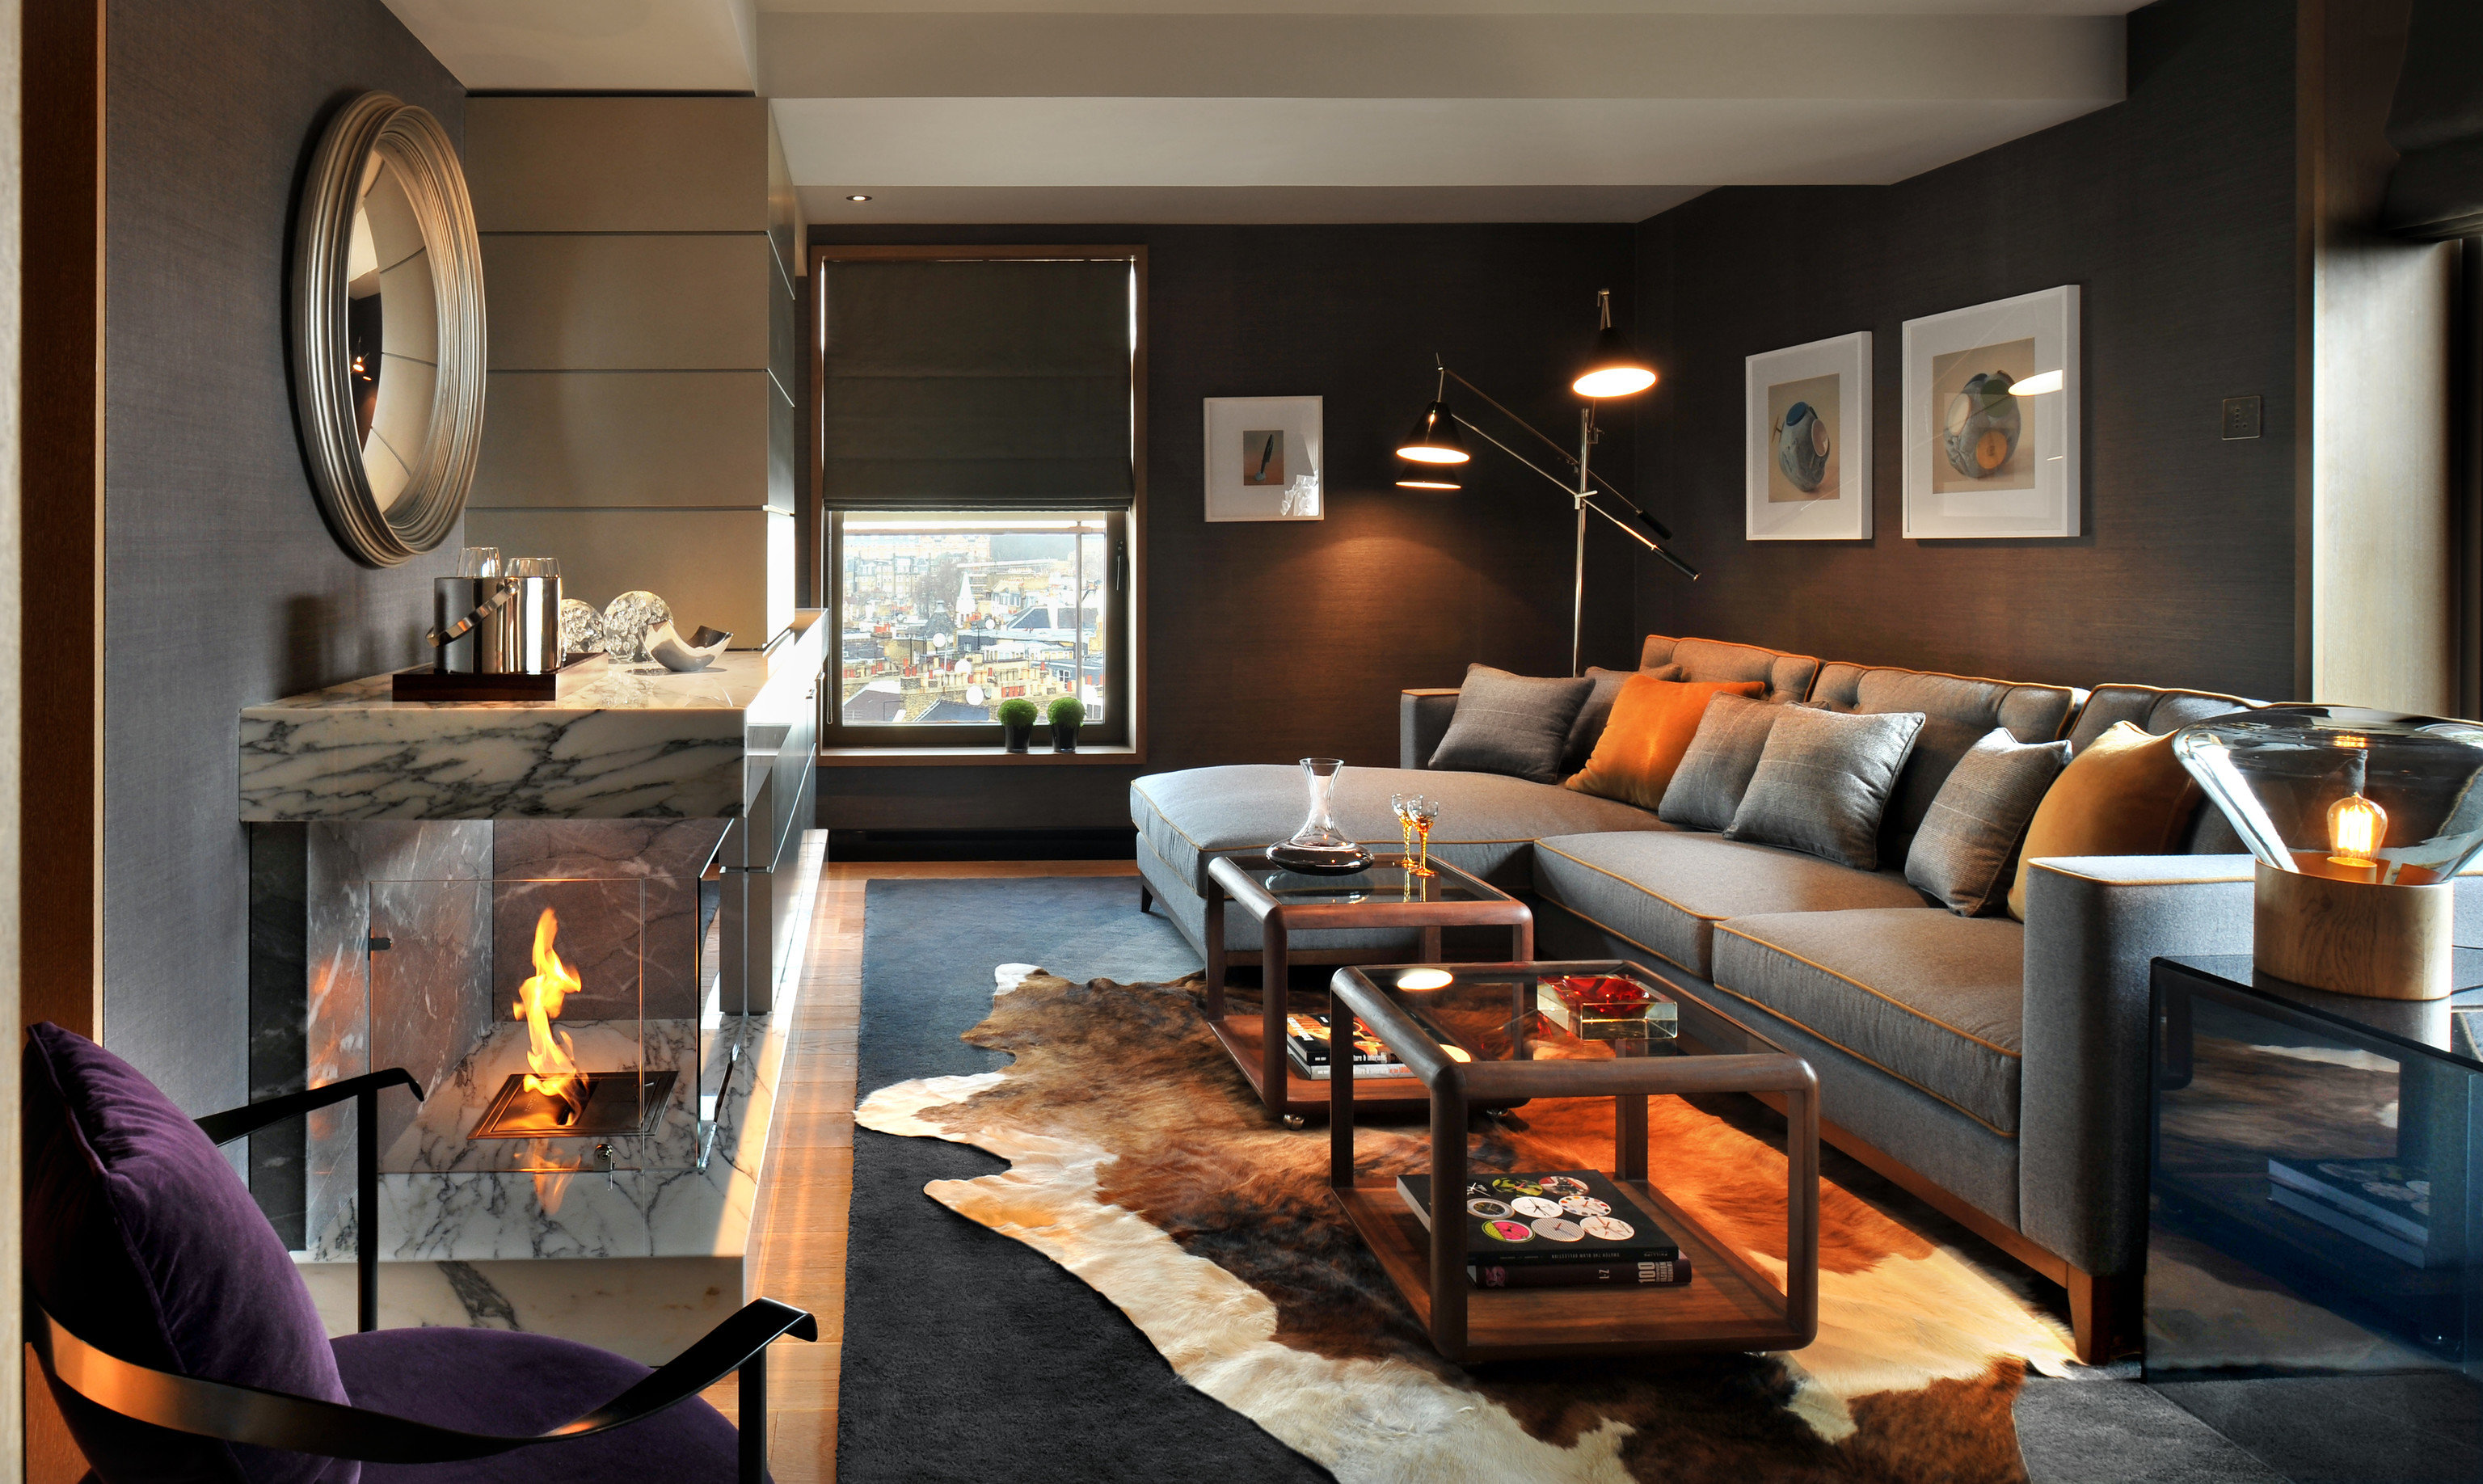 living room home hearth interior designer wood burning stove